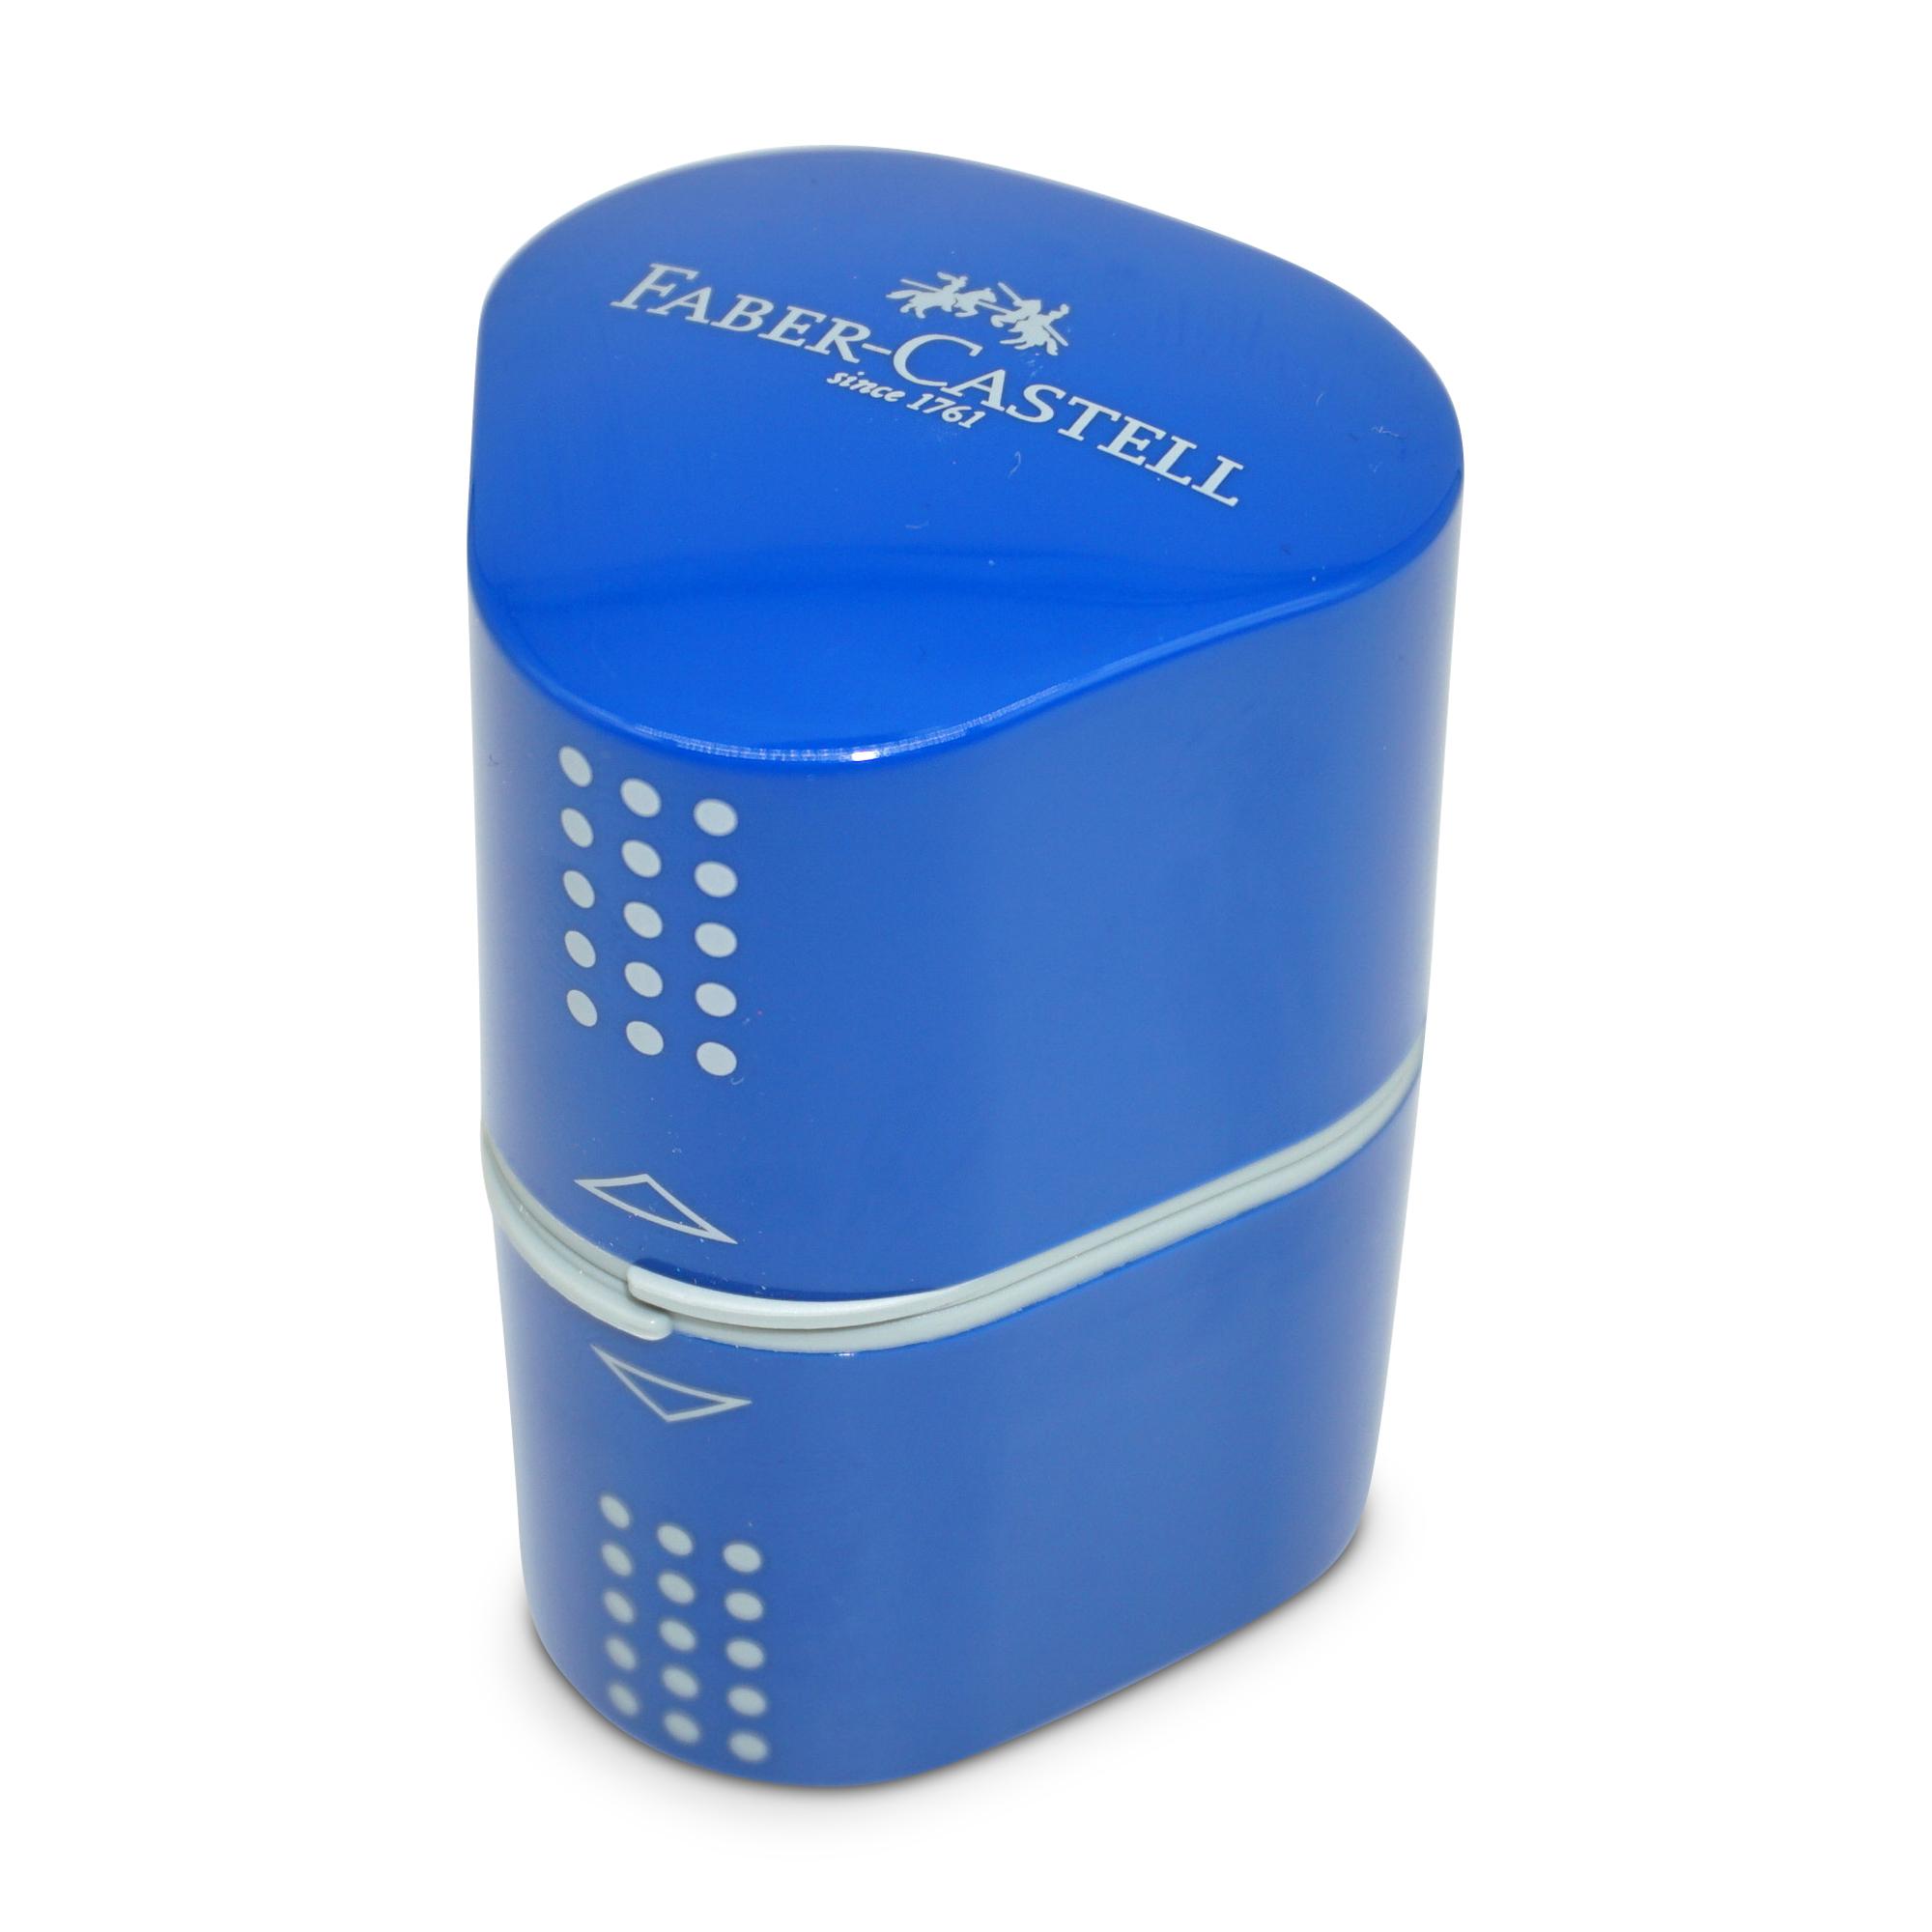 Faber-Castell  Anspitzer